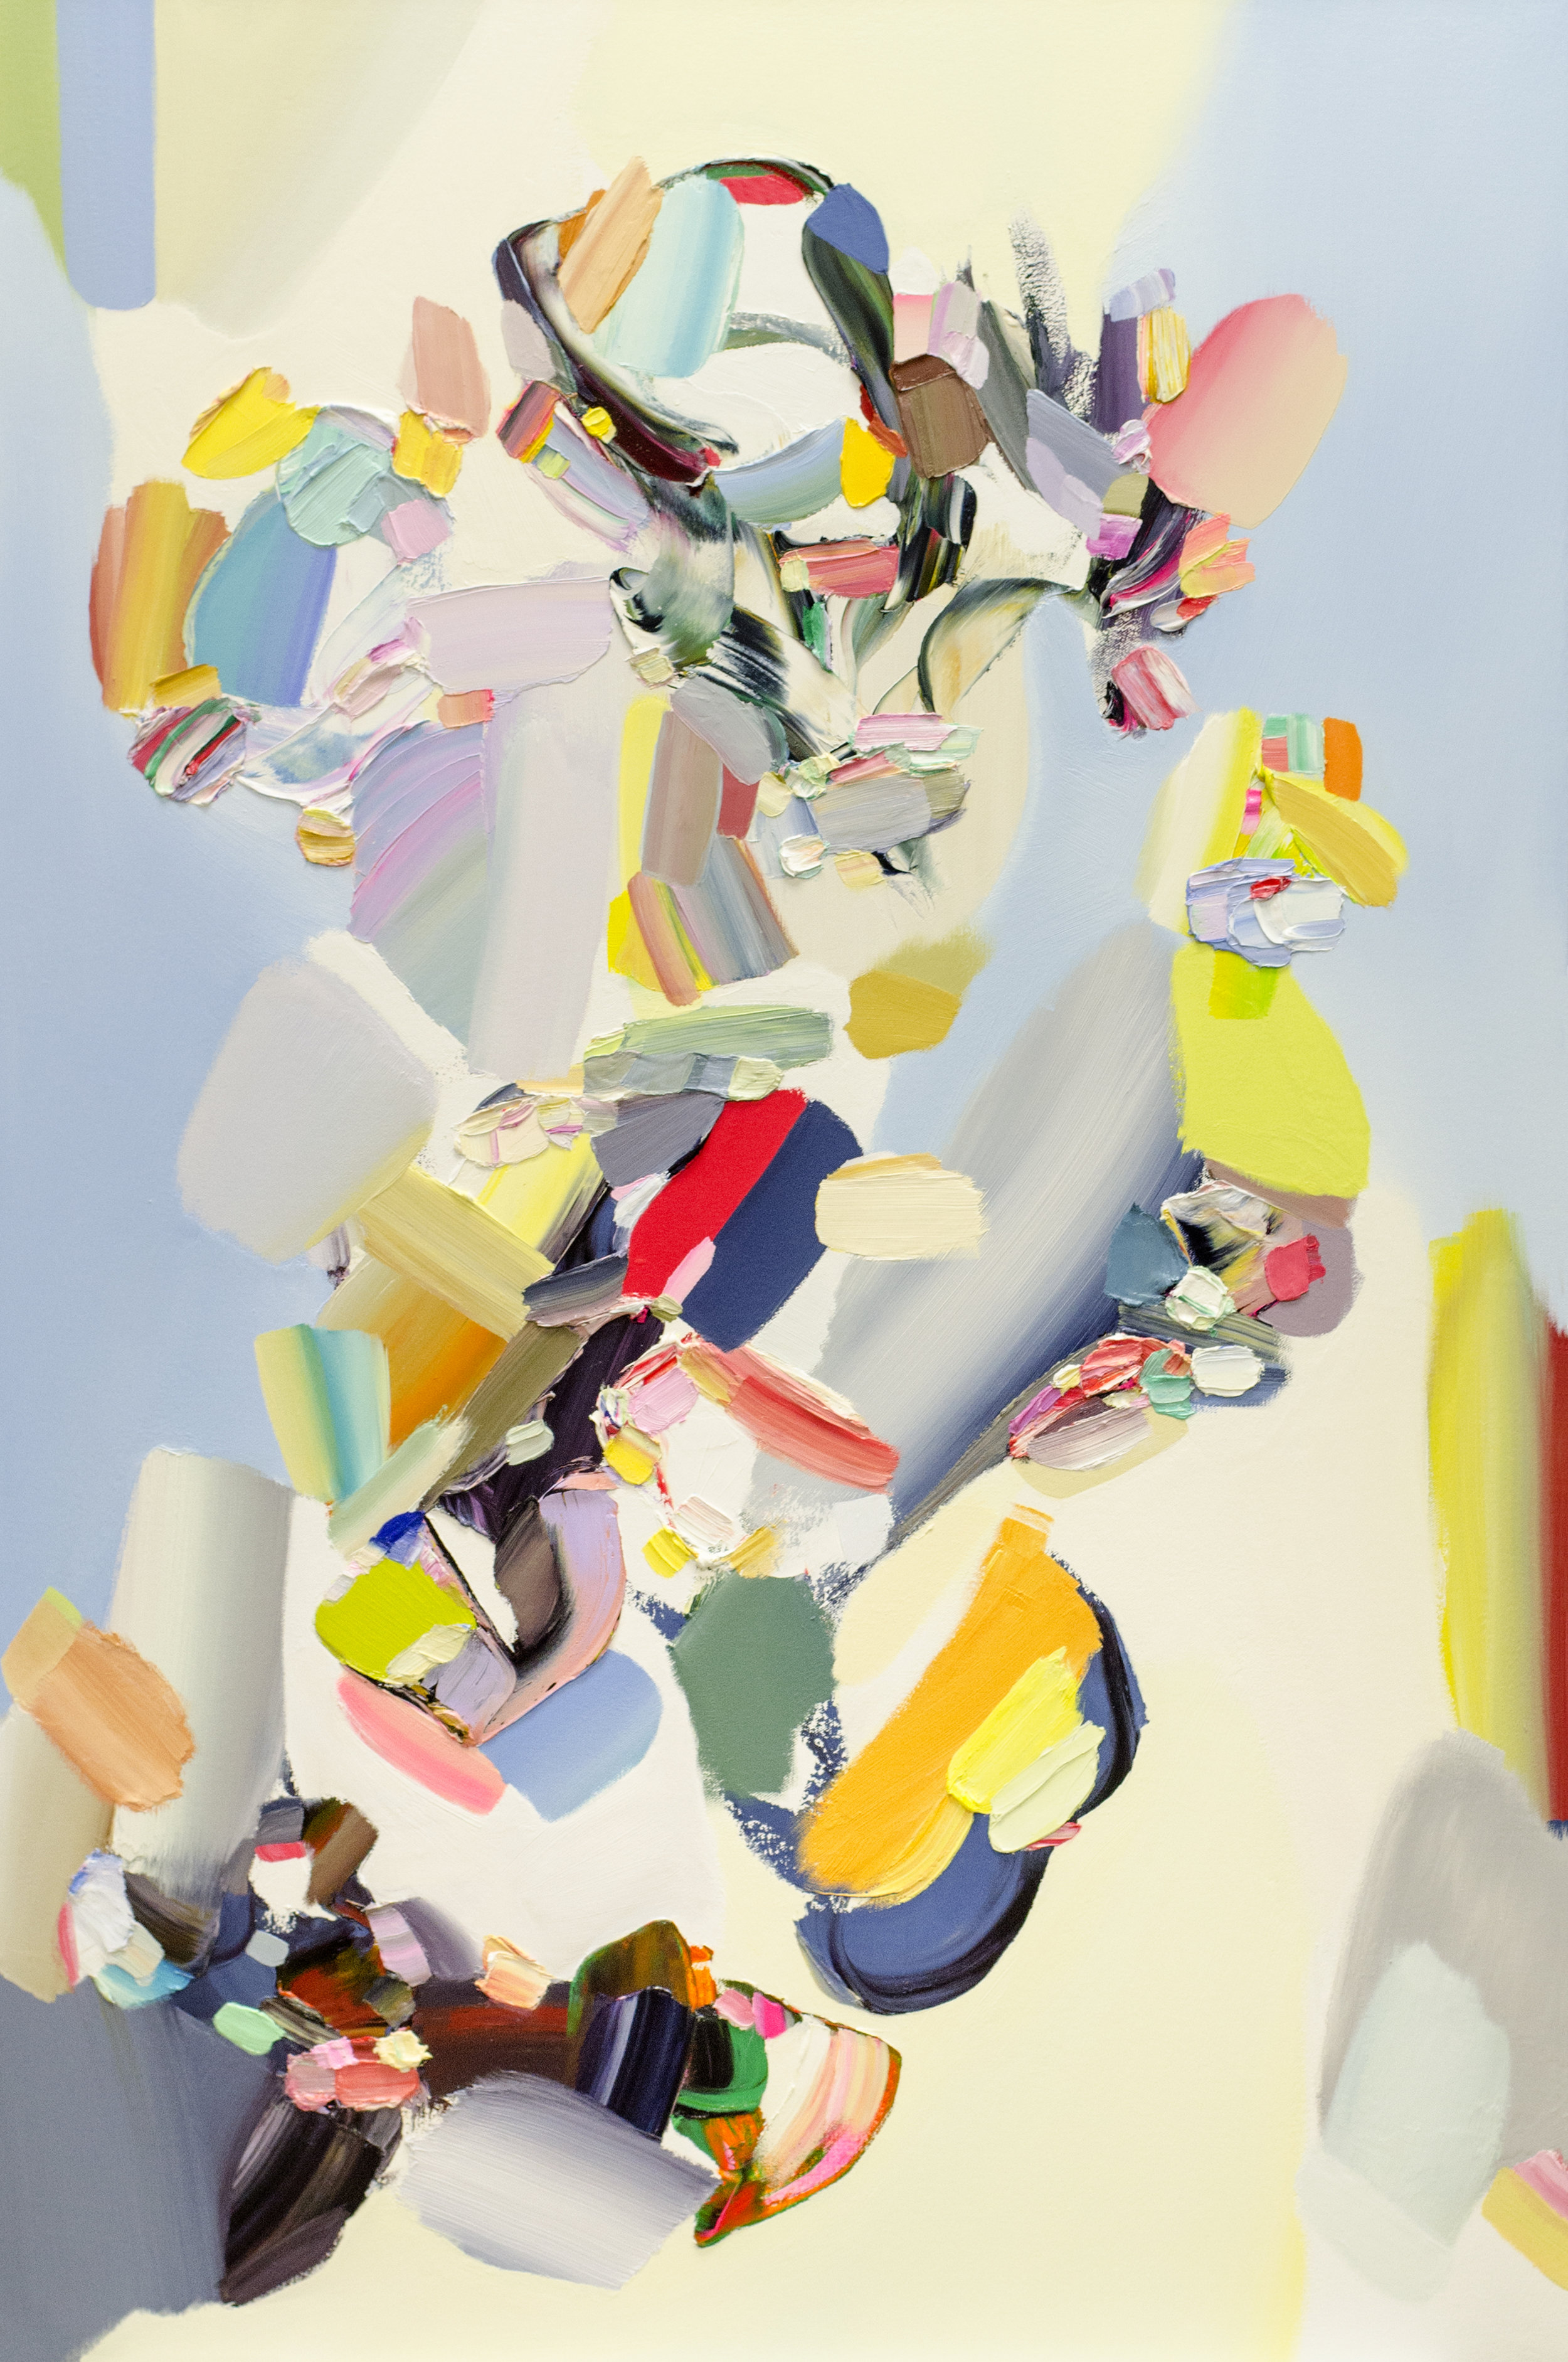 KContemporaryArt_Egan_You And Me Against The World_2018_Oil on Canvas_48x31_5600.jpg